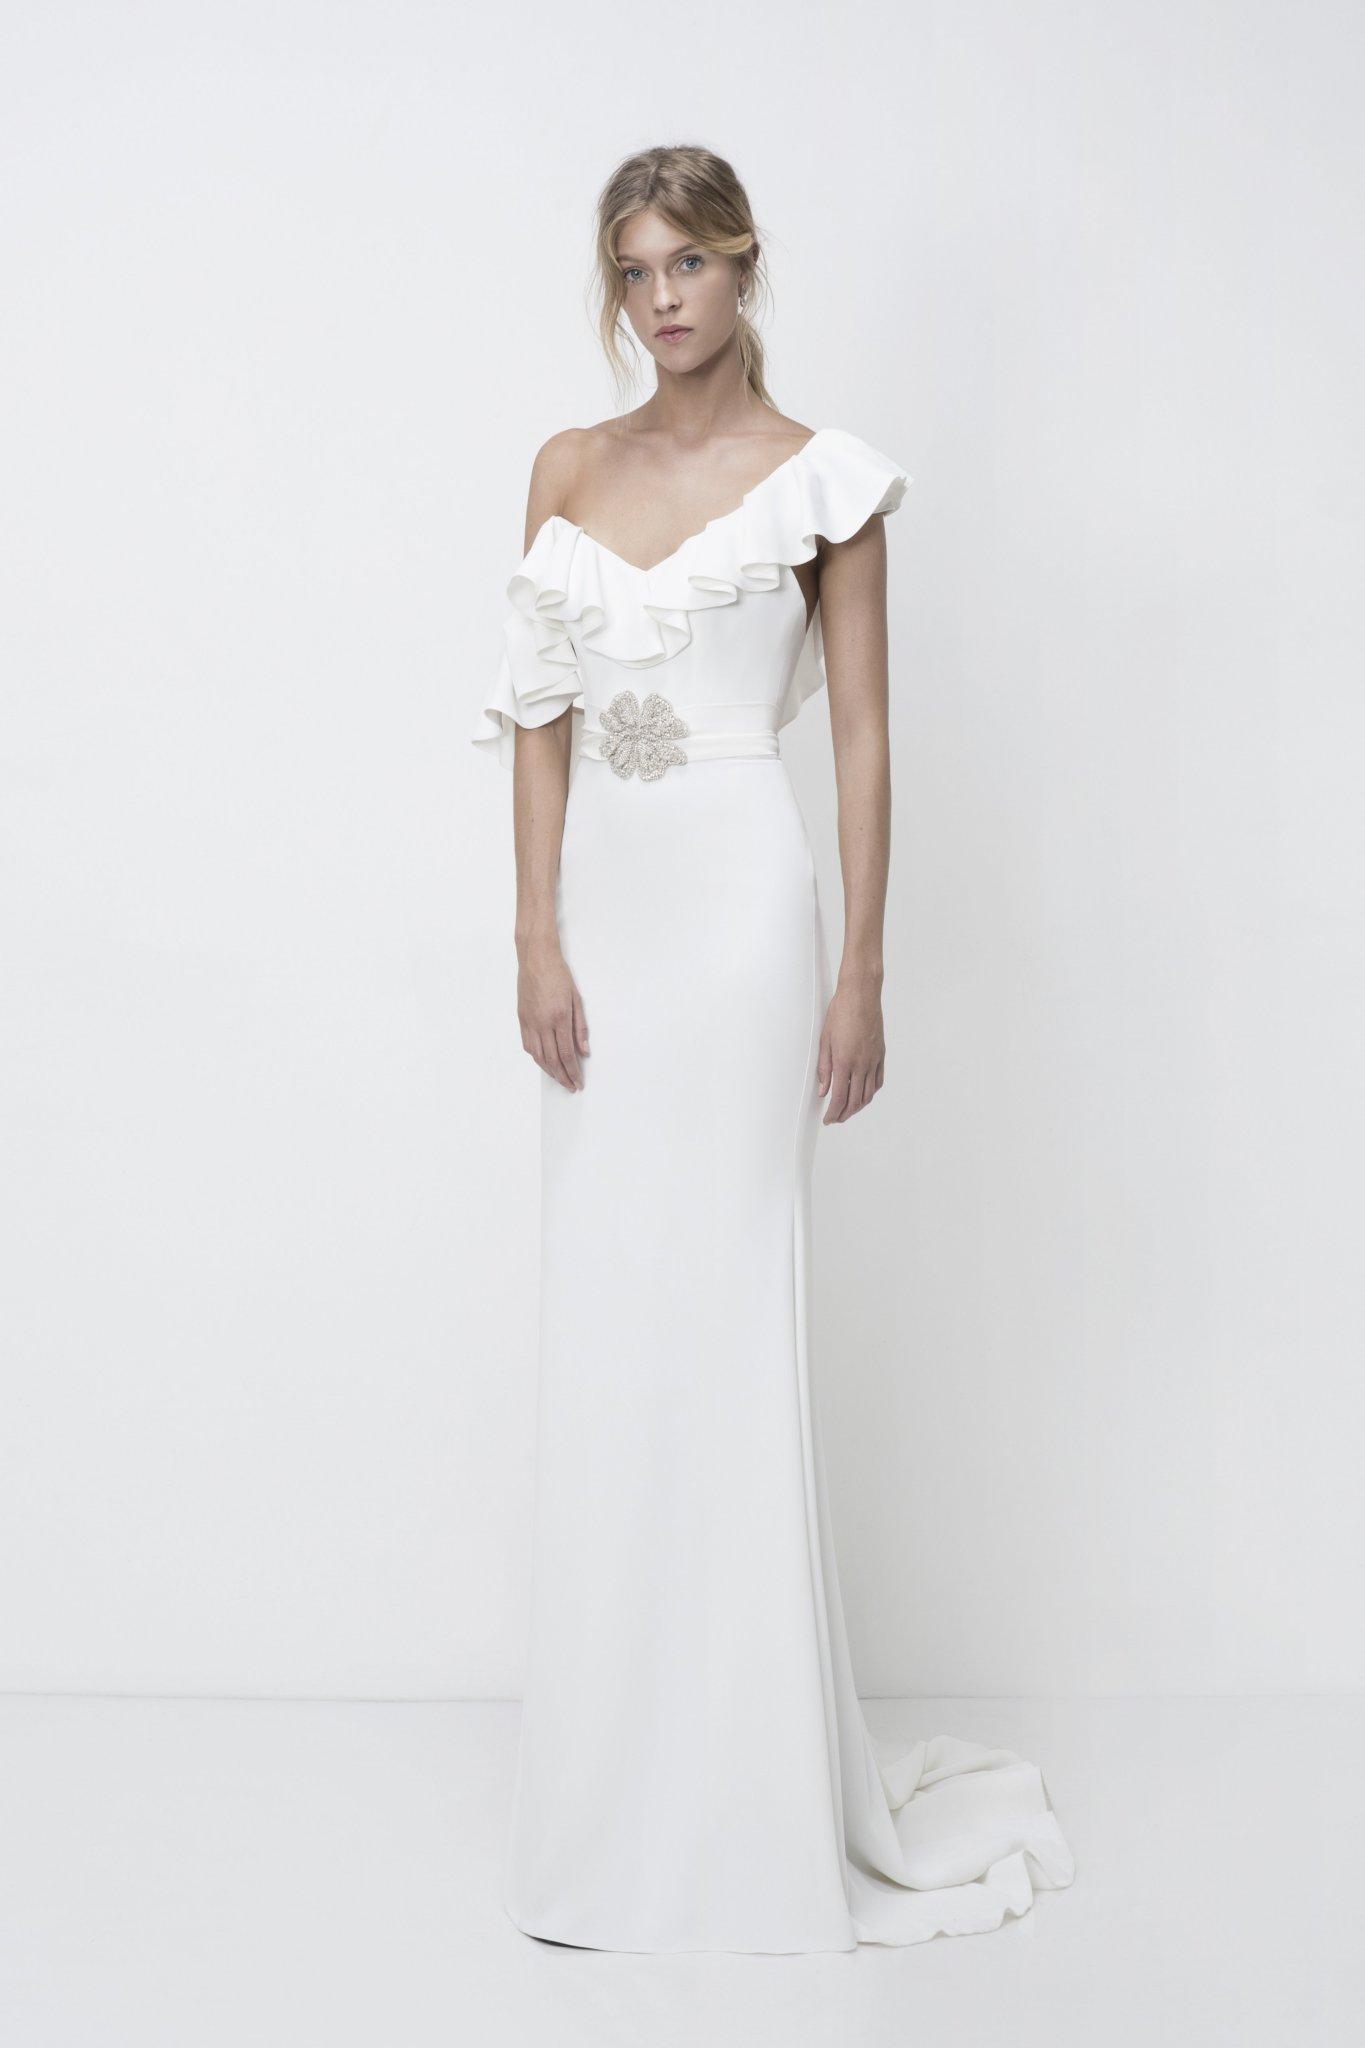 Lihi hod stella wedding dress browns bride for Lihi hod wedding dress for sale